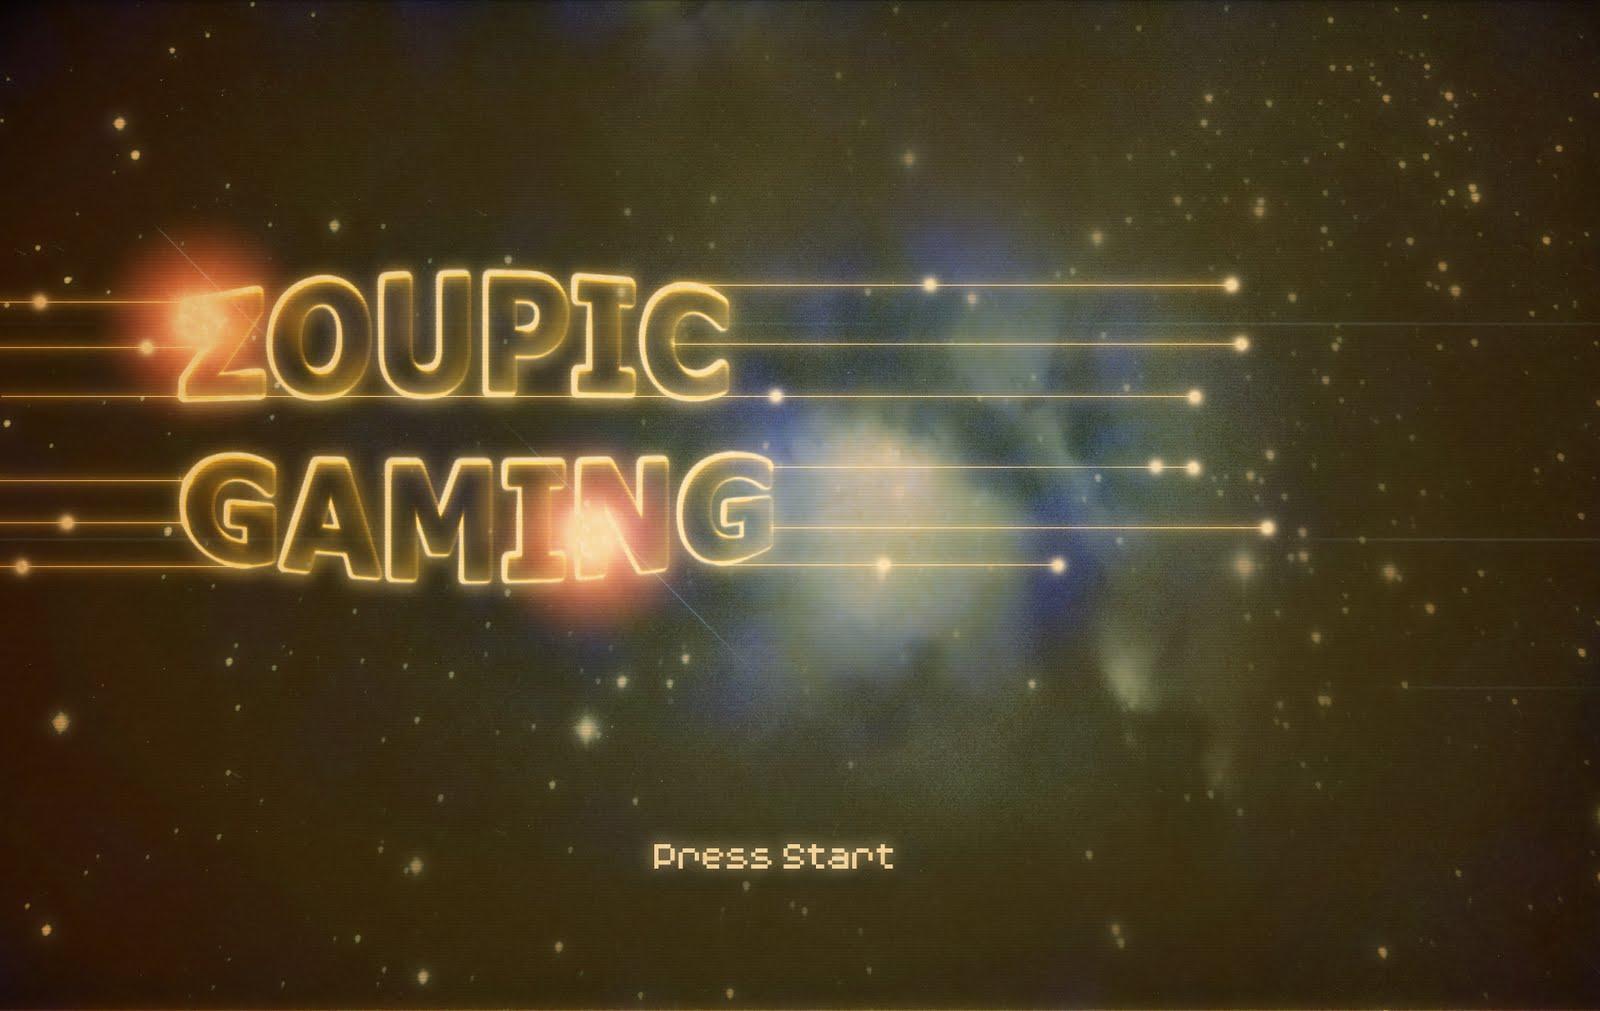 Zoupic Gaming